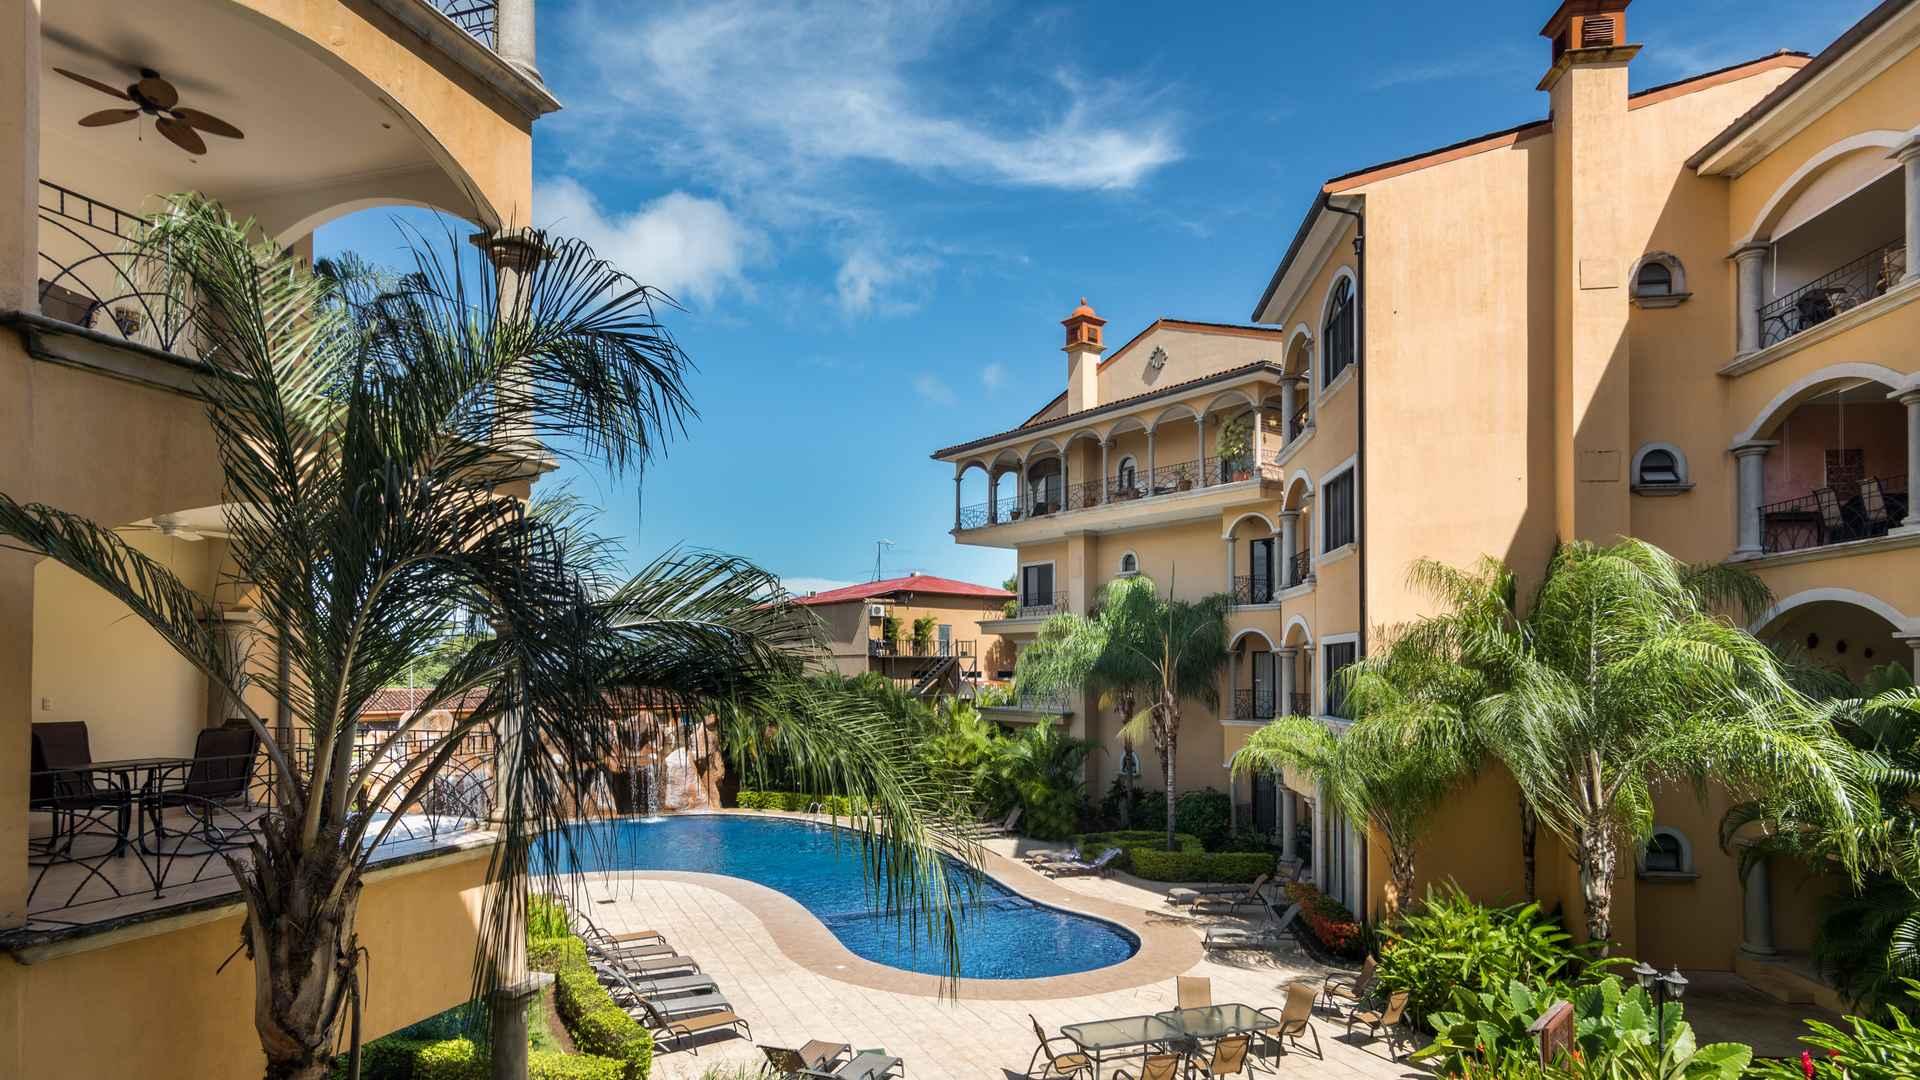 Sunrise resort with oversized pool